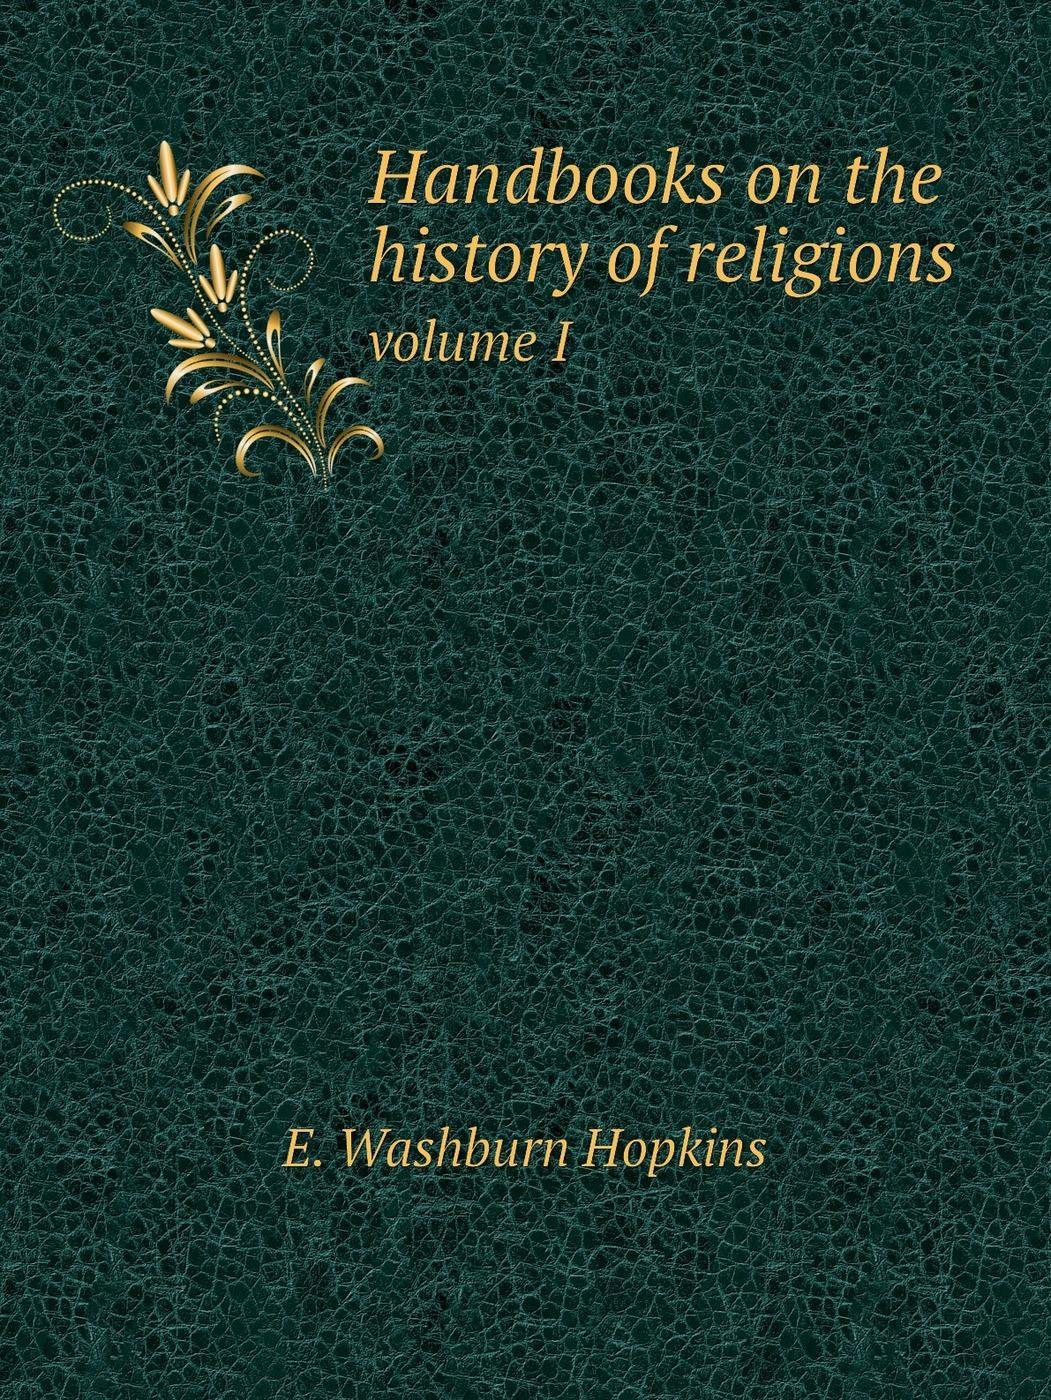 Handbooks on the history of religions. volume I